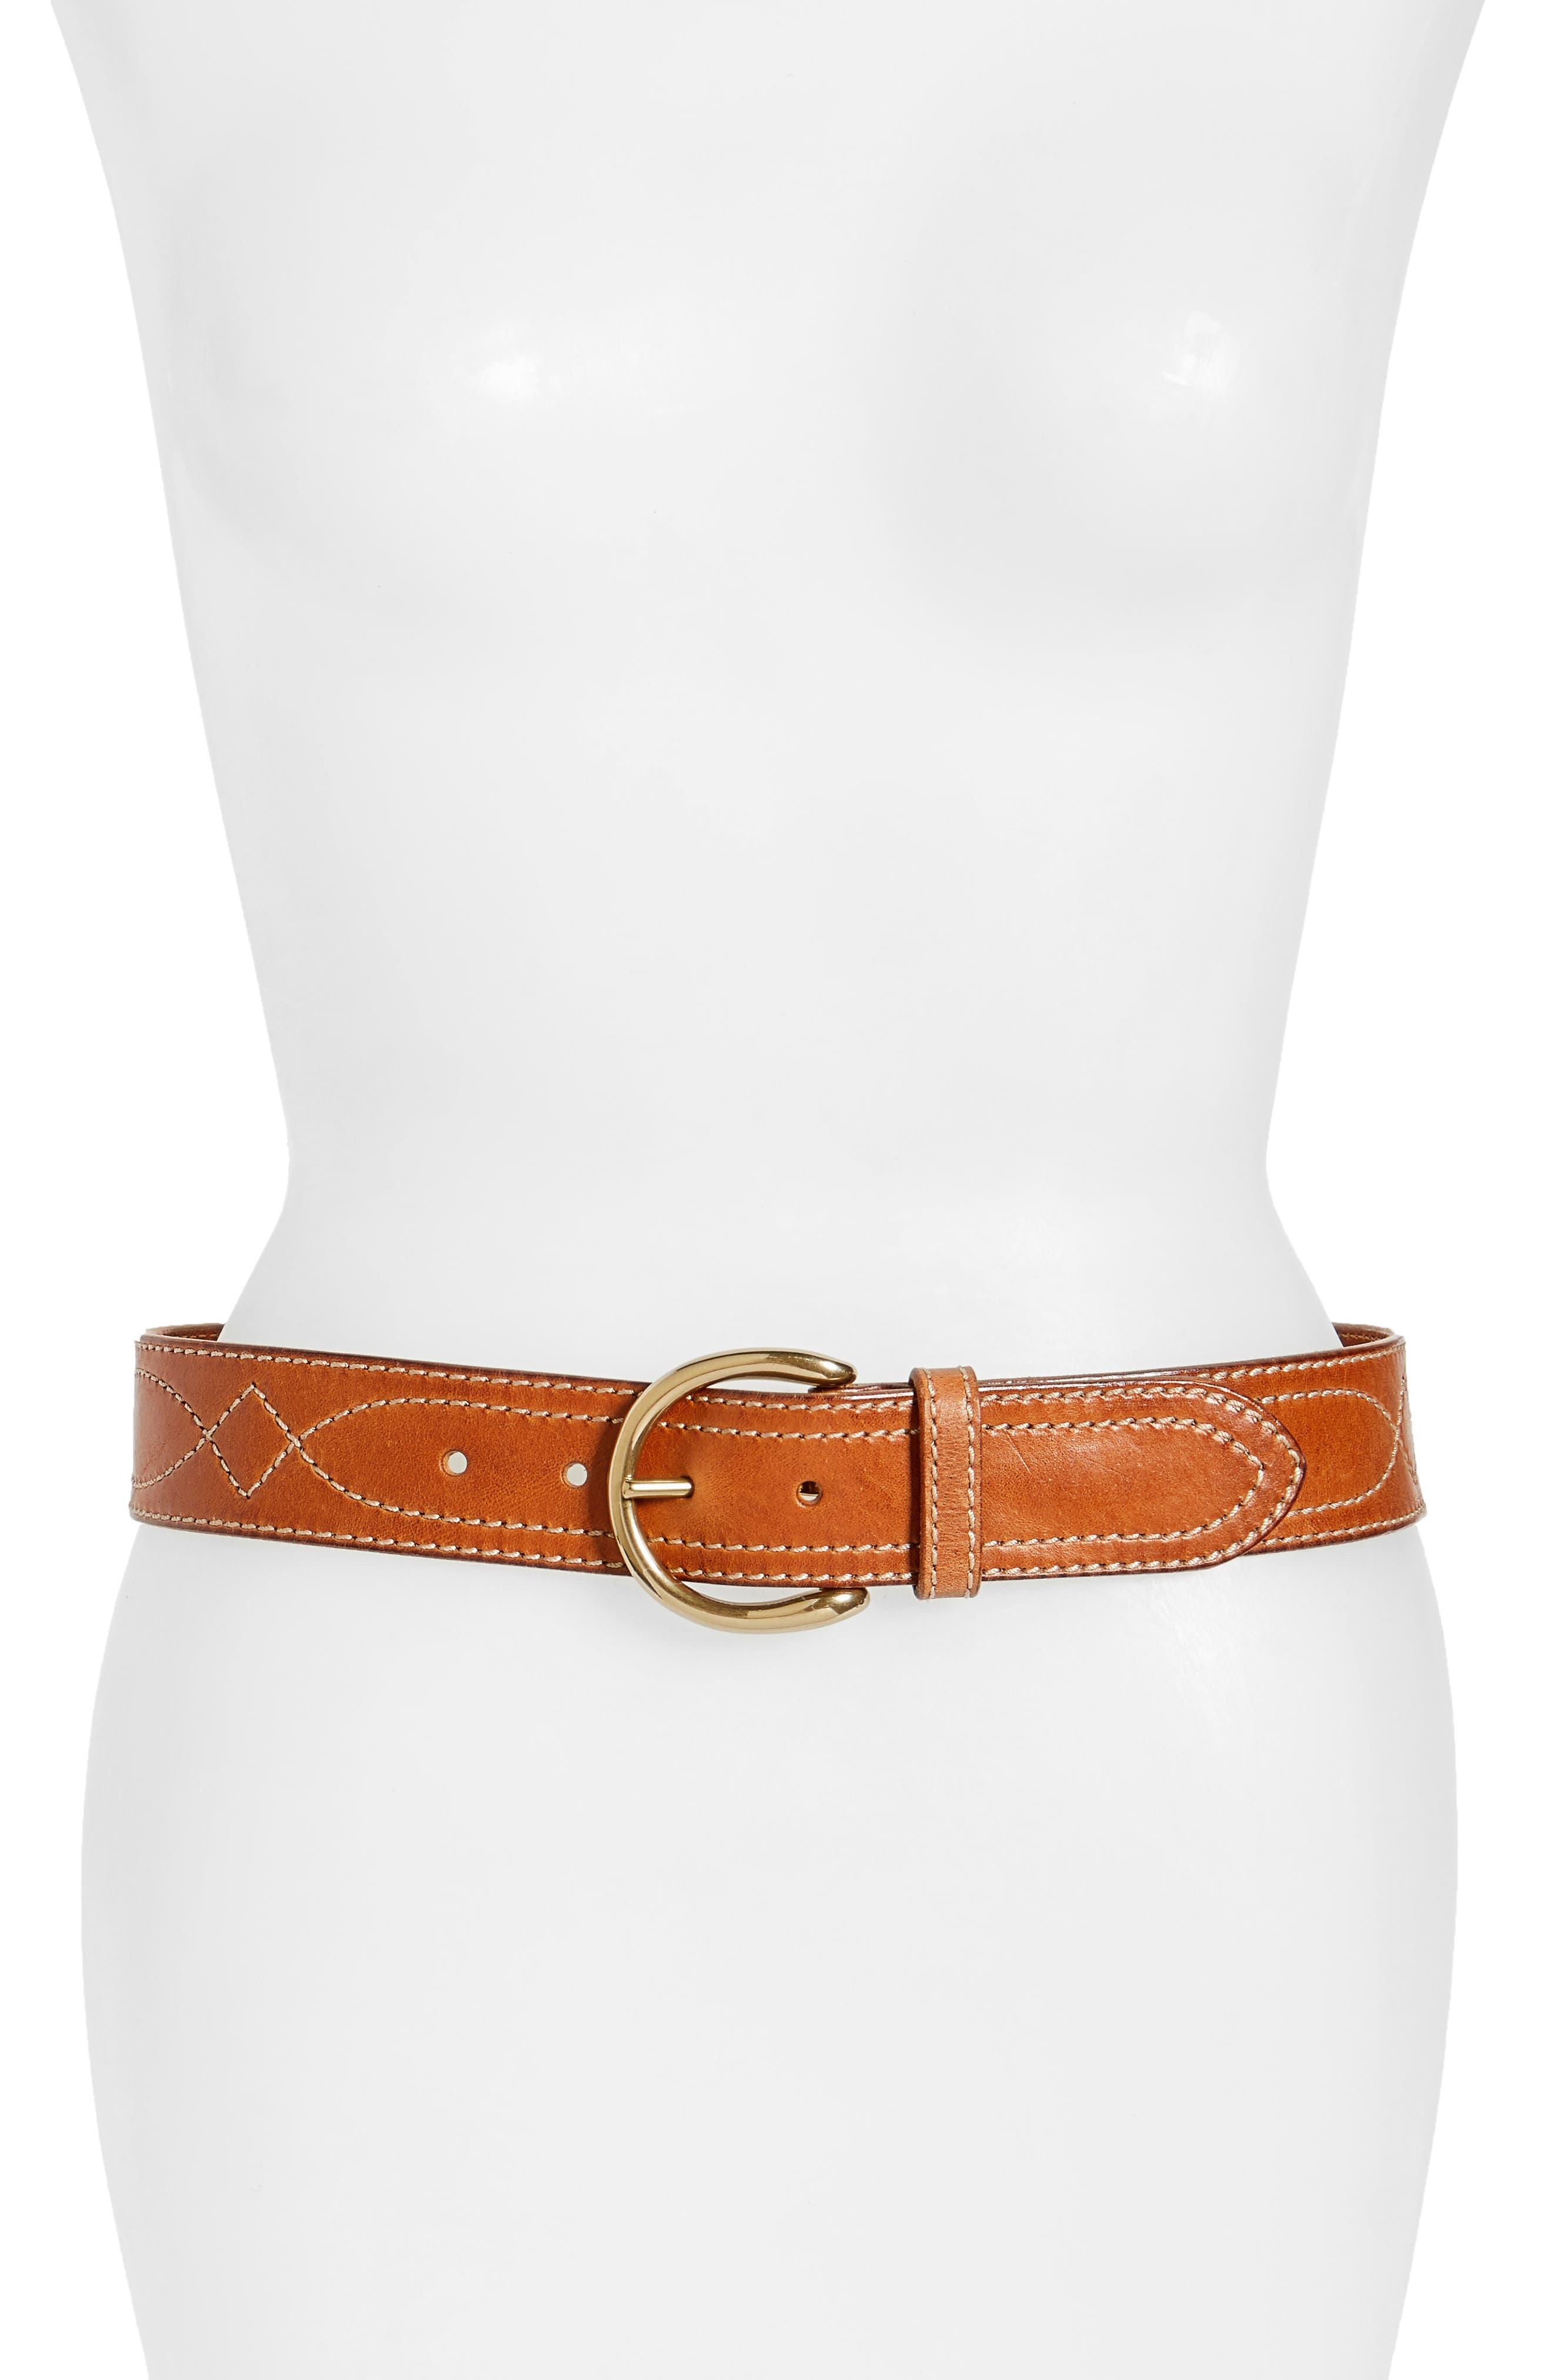 FRYE Campus Stitched Leather Belt